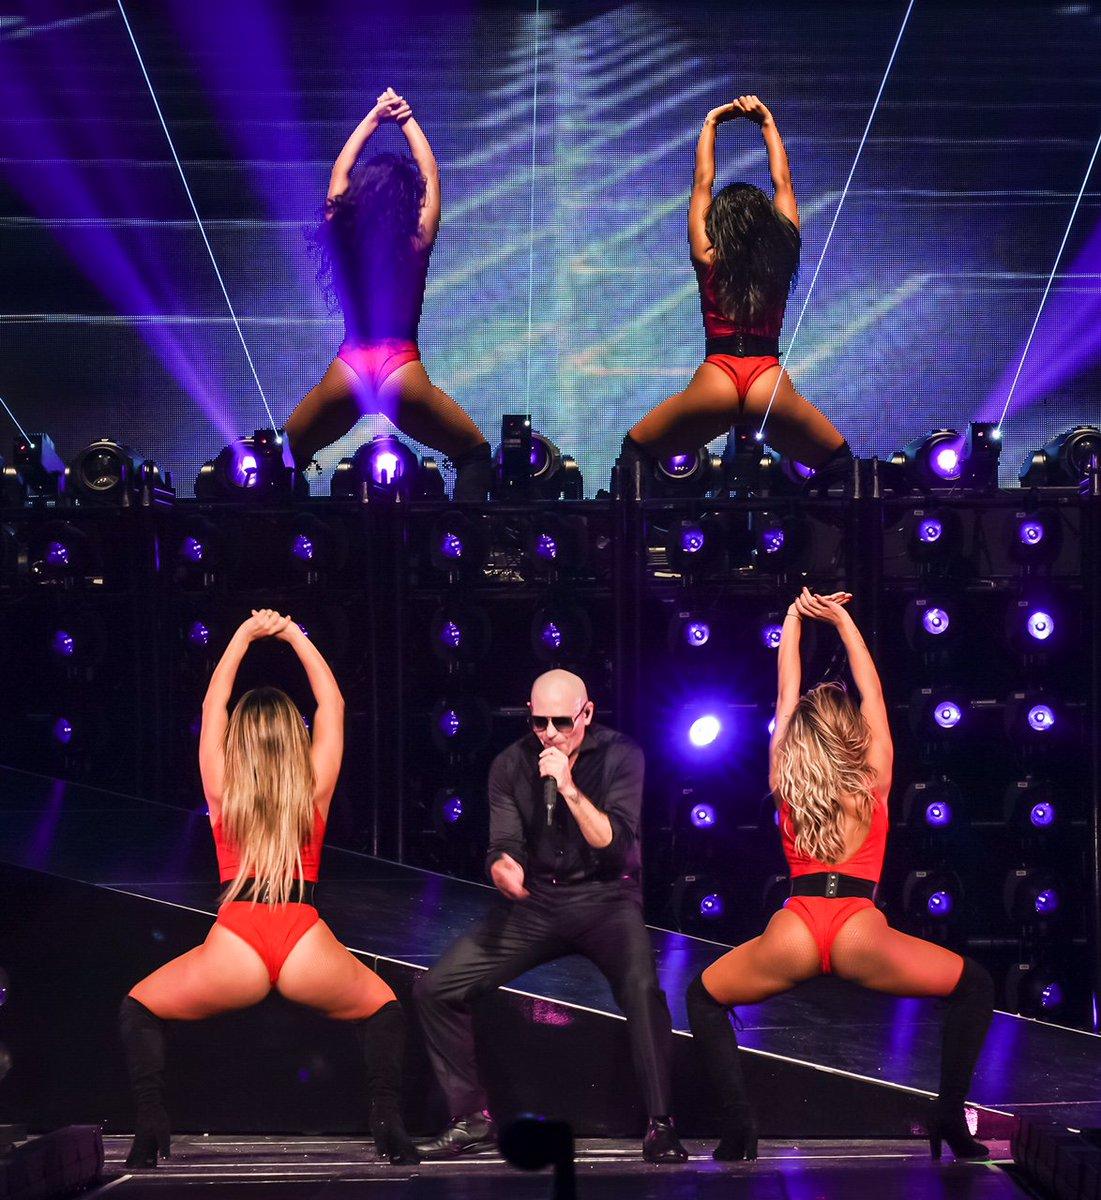 Hello Miami! Let's represent the 305 tonight #EnriquePitbullTour https://t.co/zE5PbpU7A7